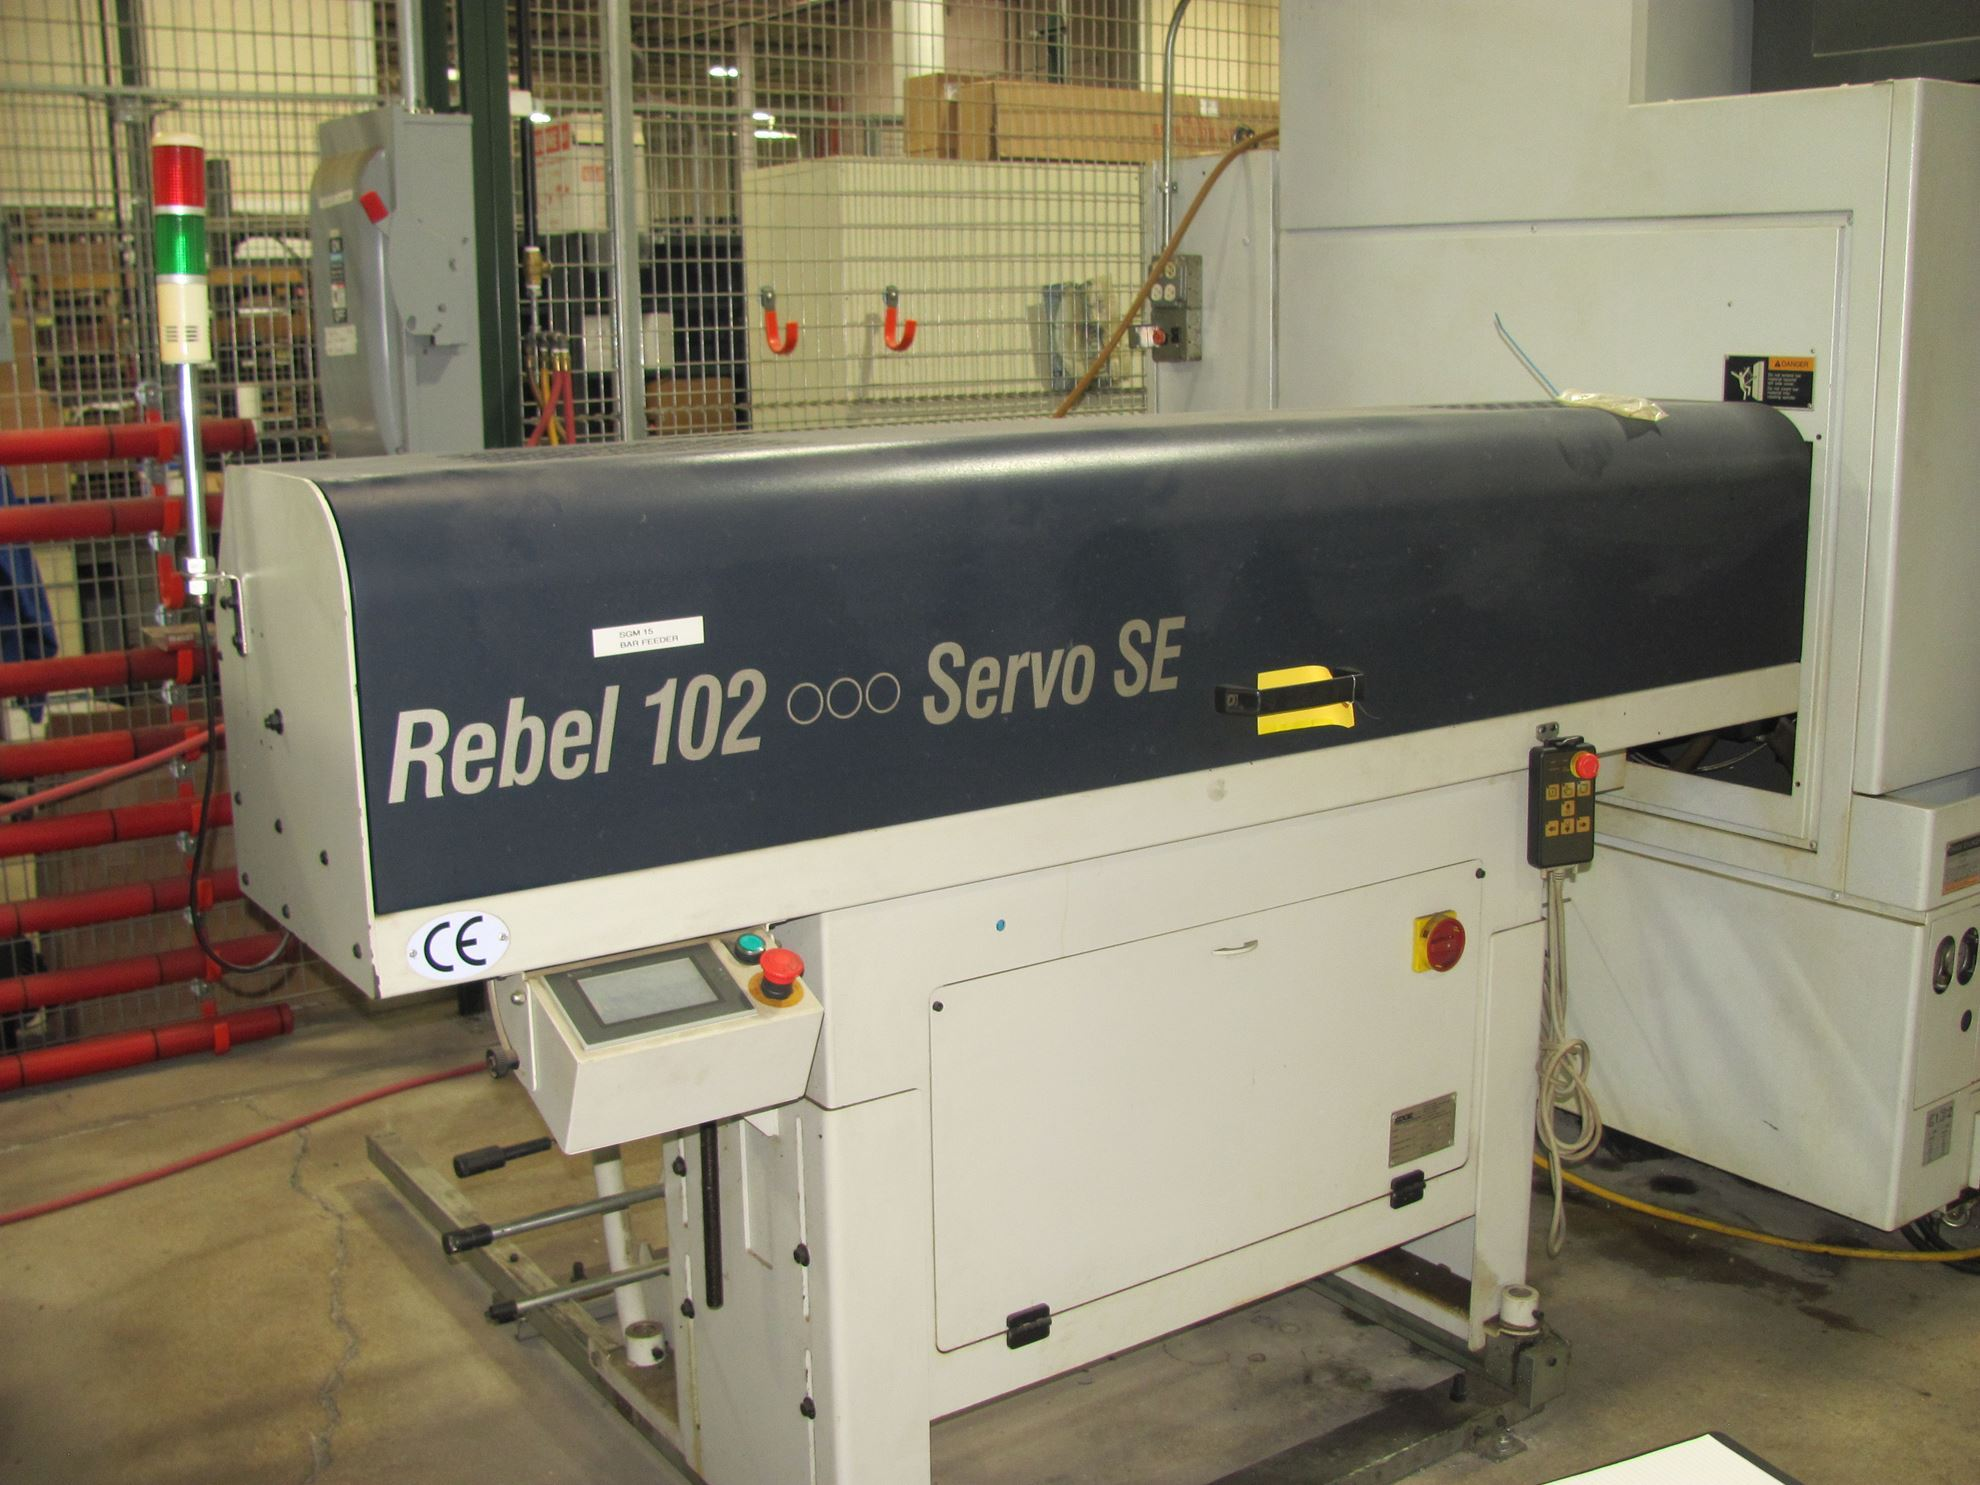 "20028 - 4"" EDGE TECHNOLOGIES REBEL 102 SERVO SE MAGAZINE TYPE BAR LOADING SYSTEM"